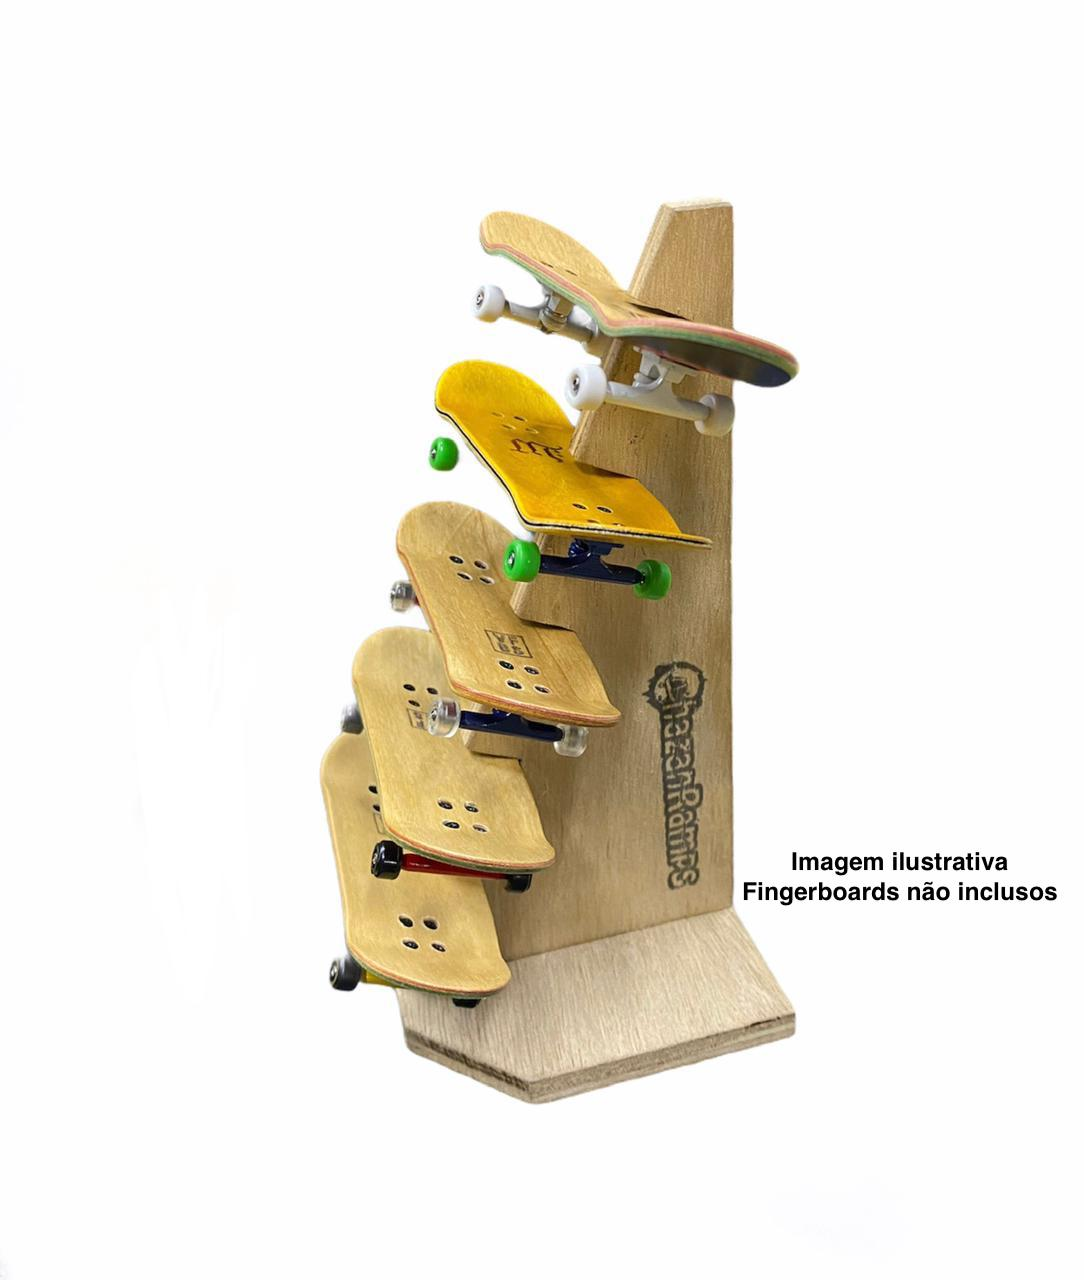 Expositor de Mesa para Fingerboards Chazan Ramps